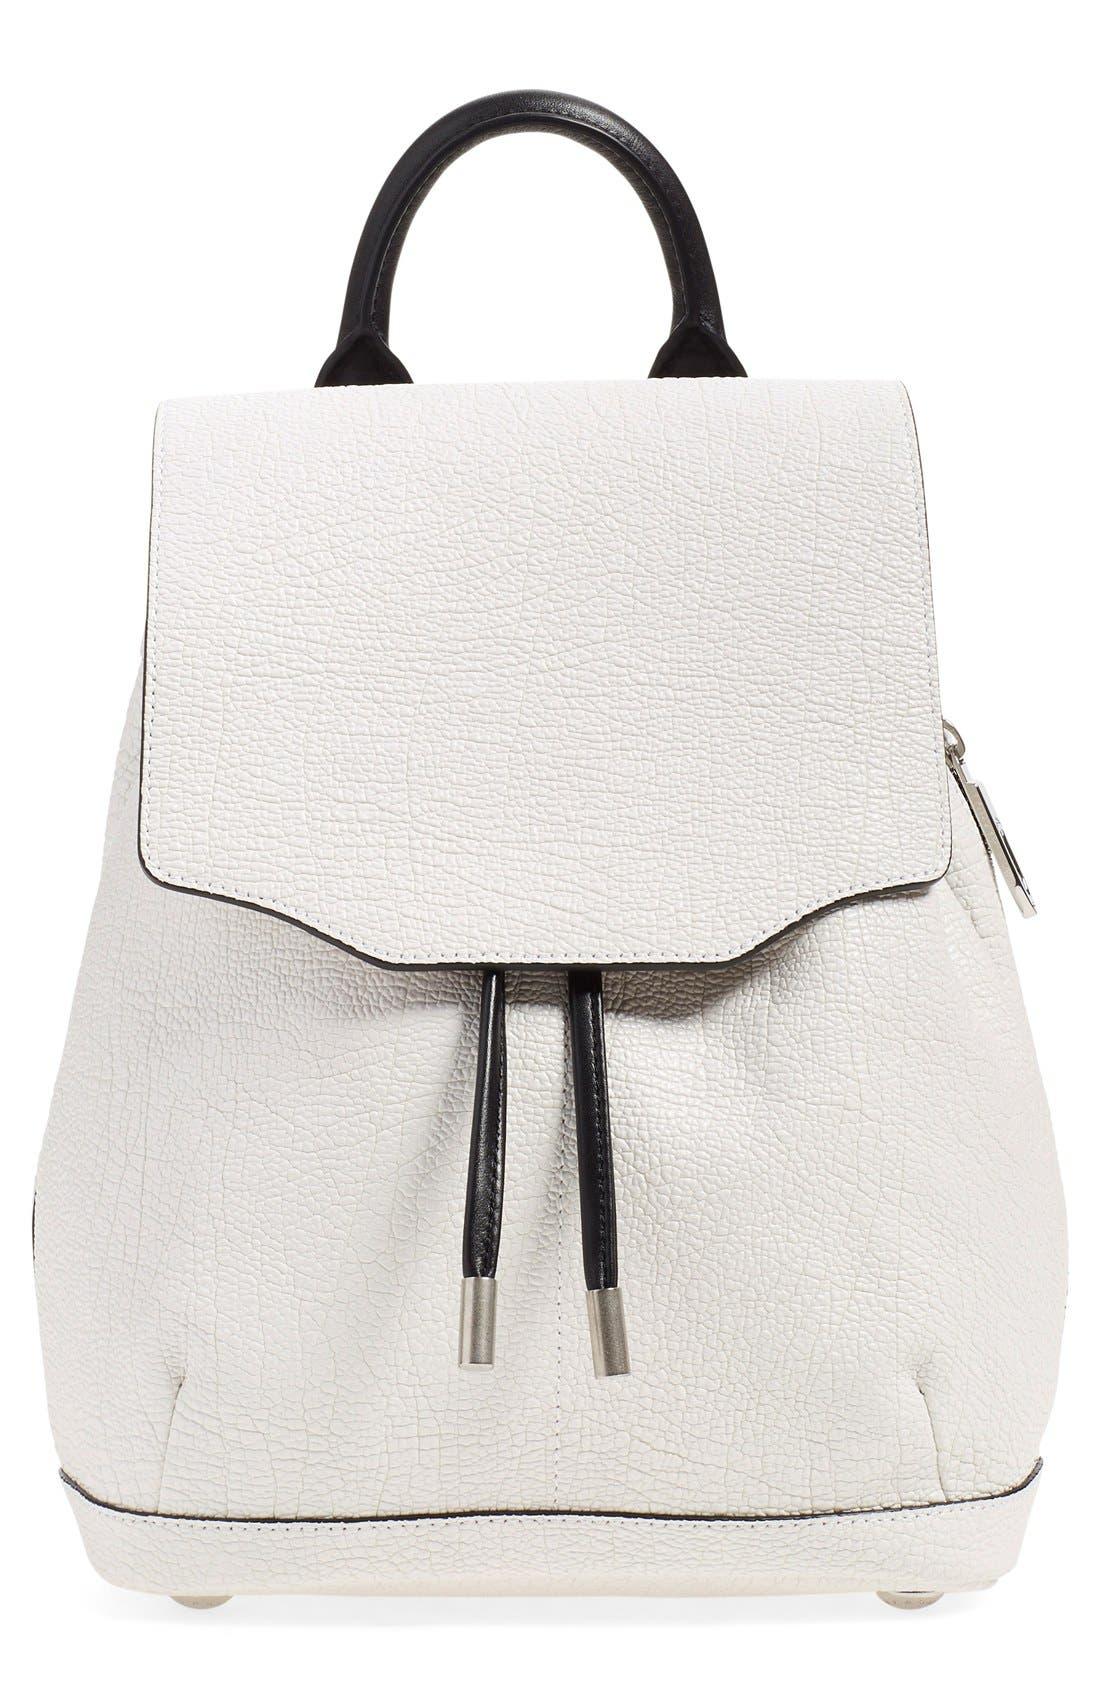 Main Image - rag & bone 'Mini Pilot' Leather Backpack